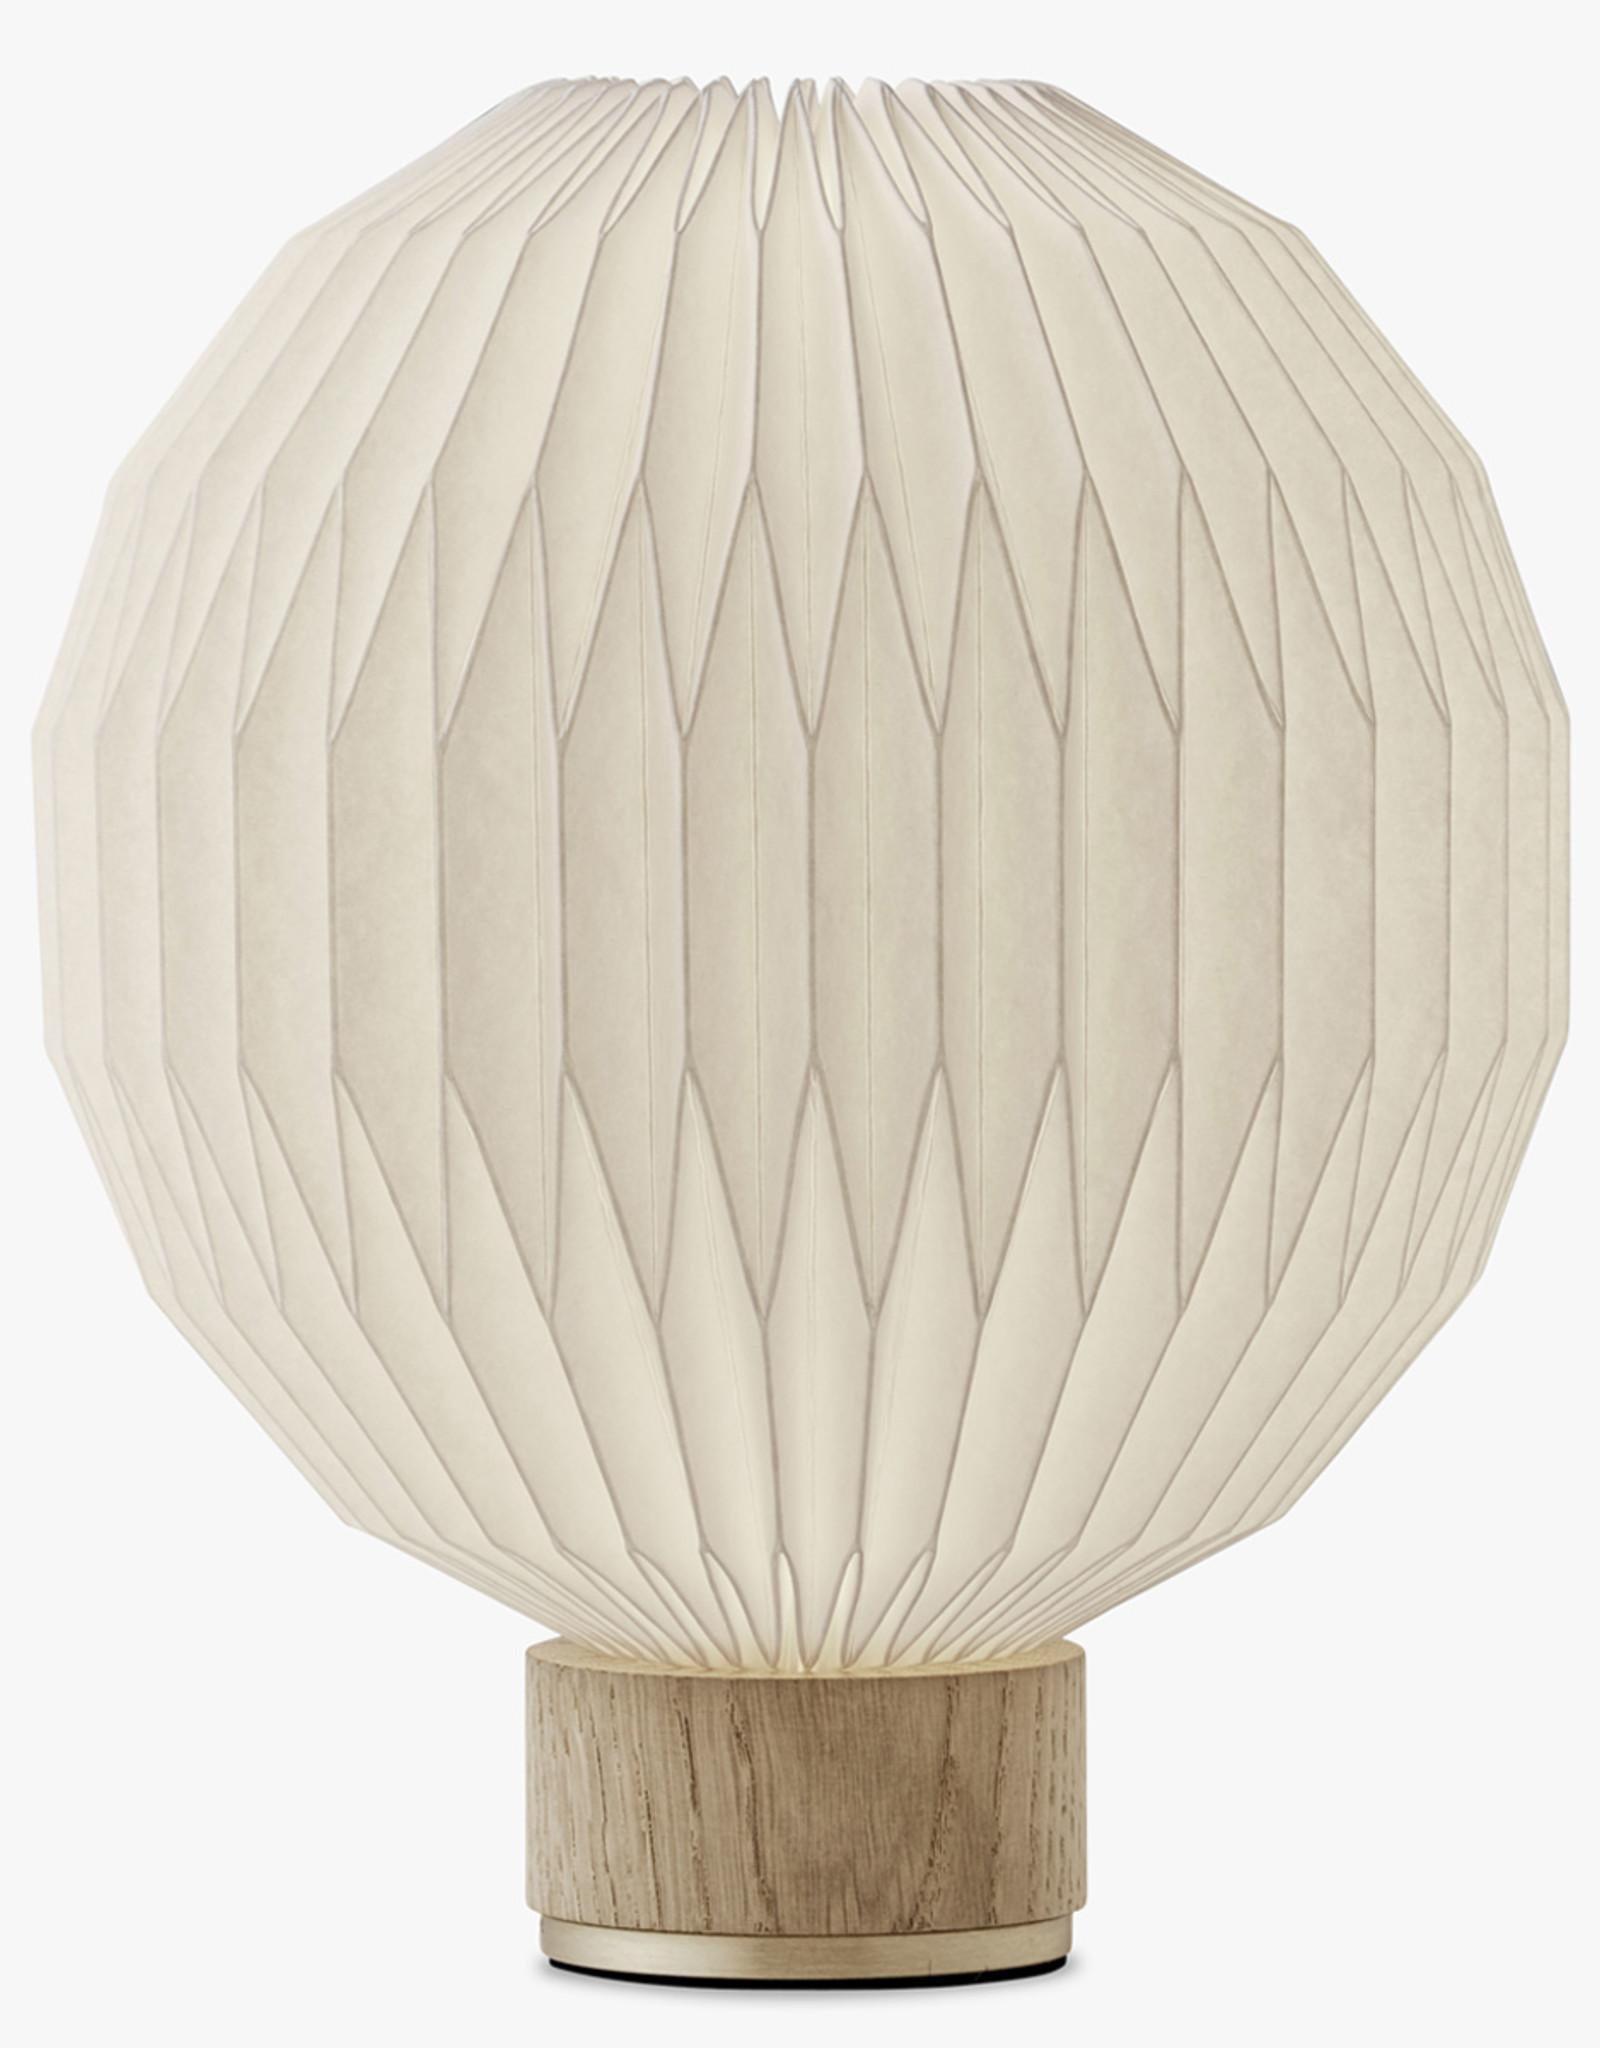 Model 375 table light by Esben Klint | S | Plastic | Oak | Dia22cm x H25cm | 1x E27 600 LM max. 20W LED bulb required